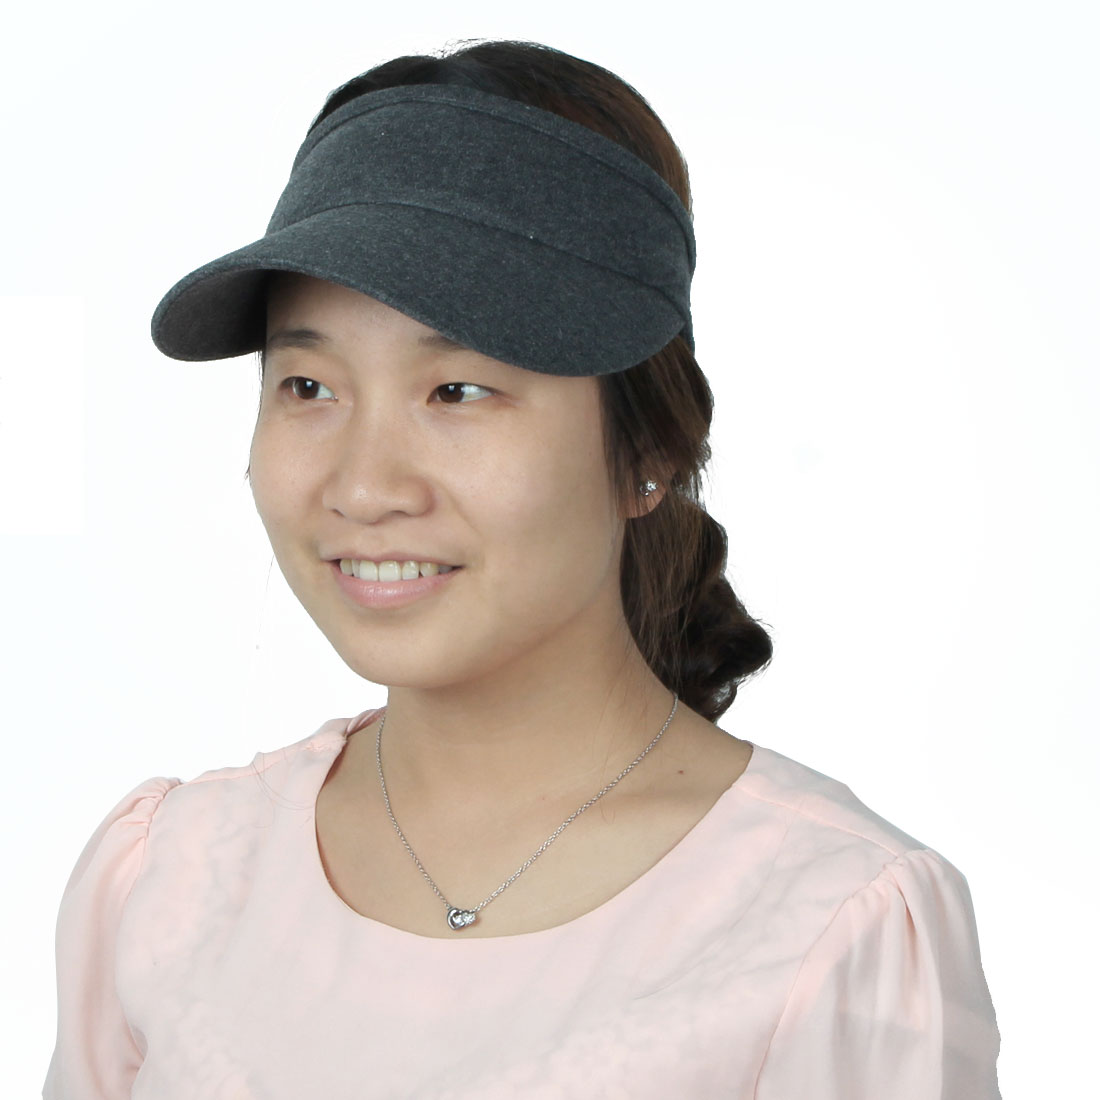 Ladies Summer Outdoor Running Golf Tennis Sports Casual Sun Visor Cap Dark Gray